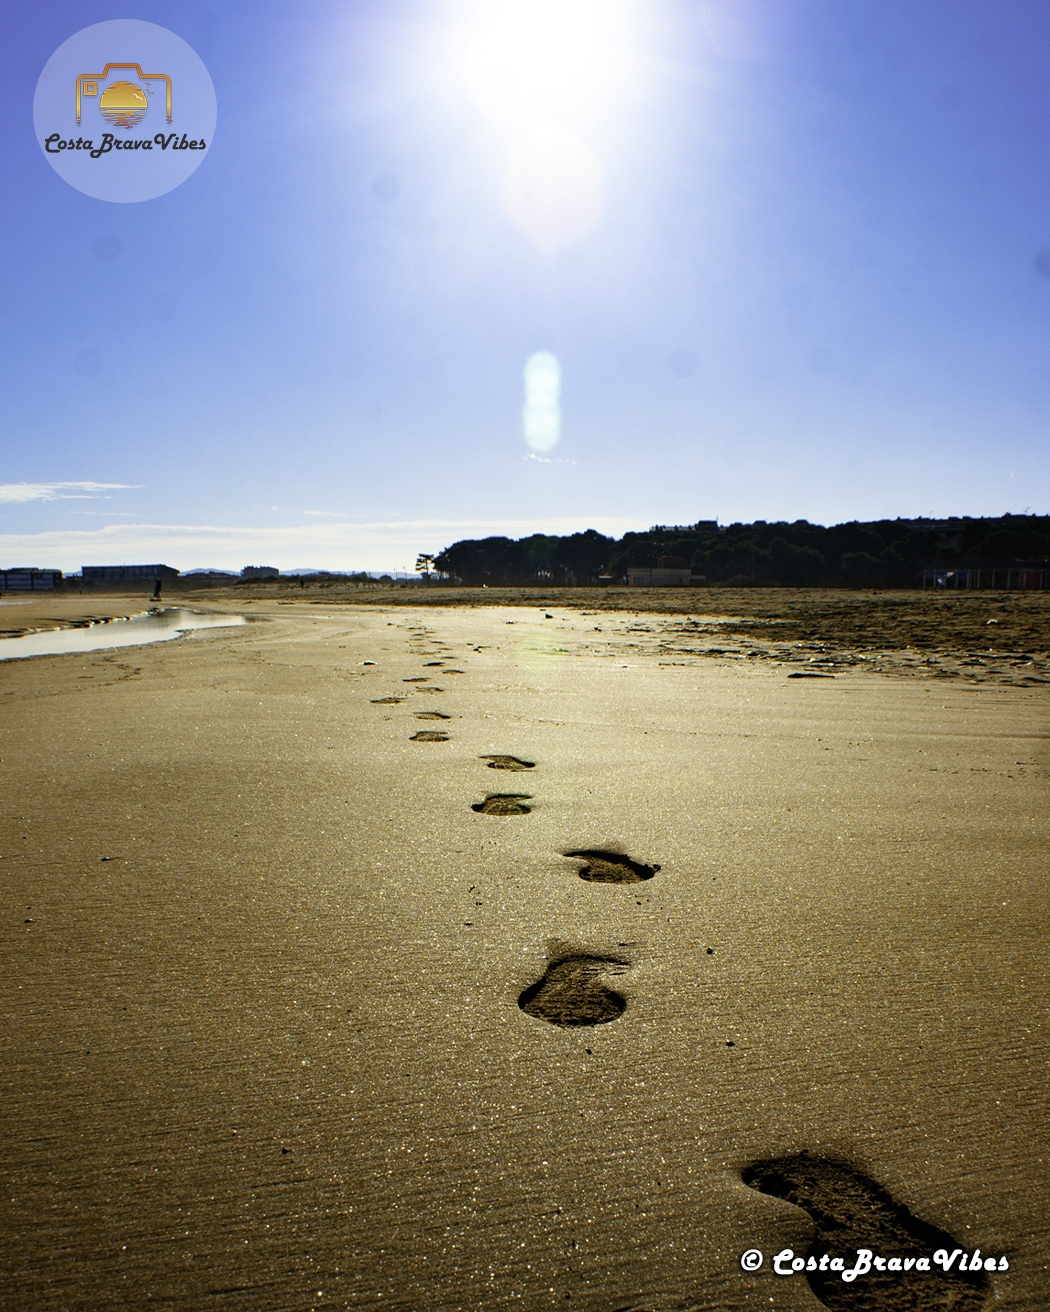 Footsteps sand Beach of Estartit Summer Spain L'Estartit Costa Brava Vibes Sun Beachlife